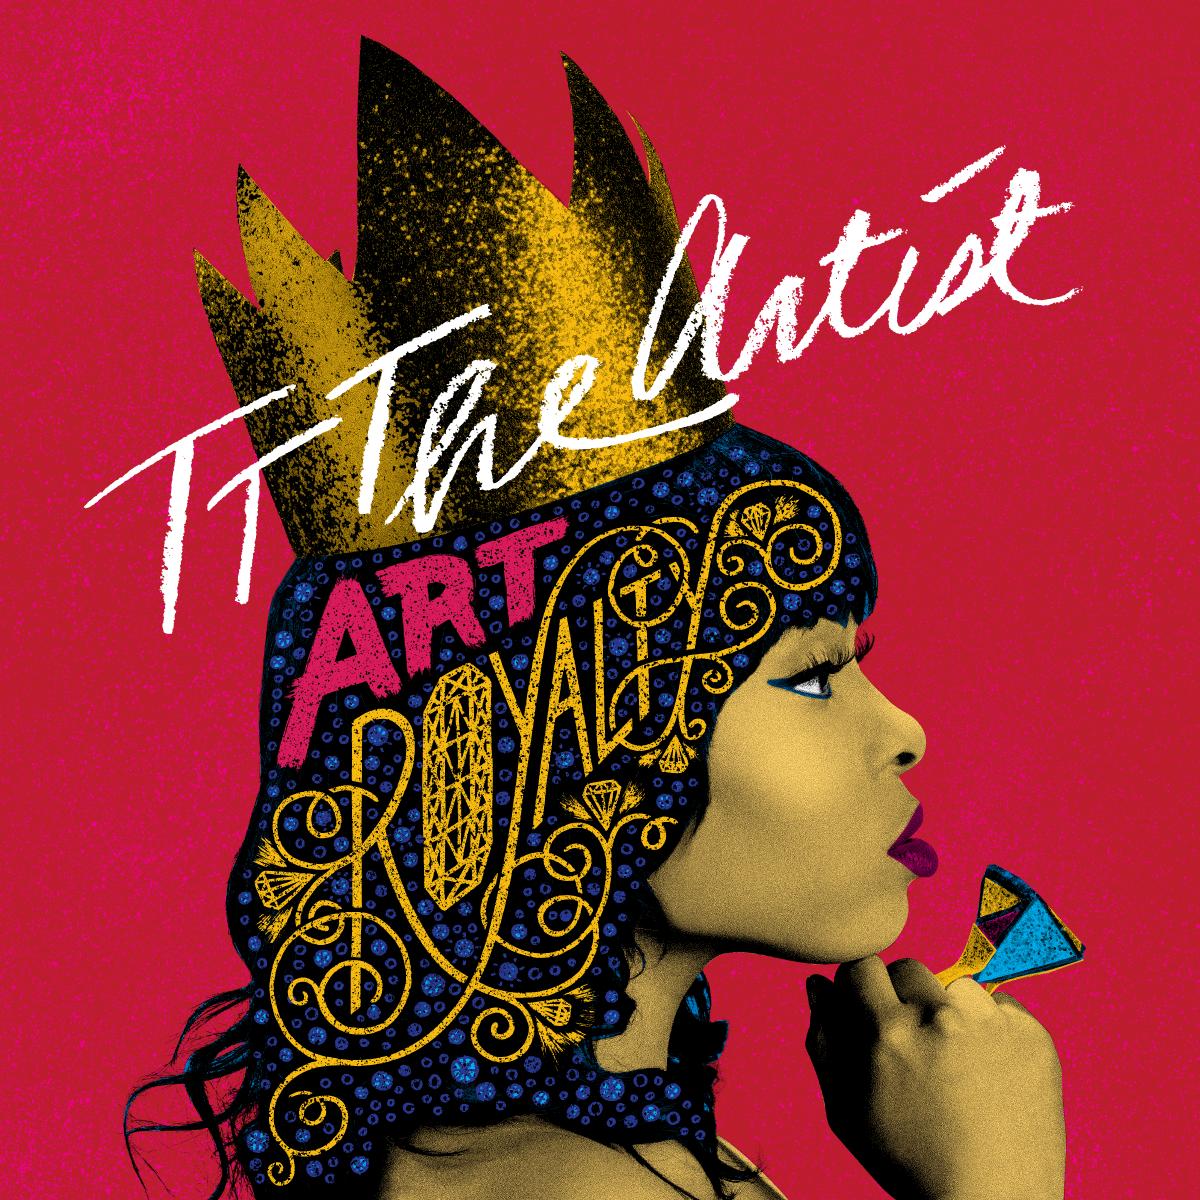 Art Royalty Cover(TT The Artist).png